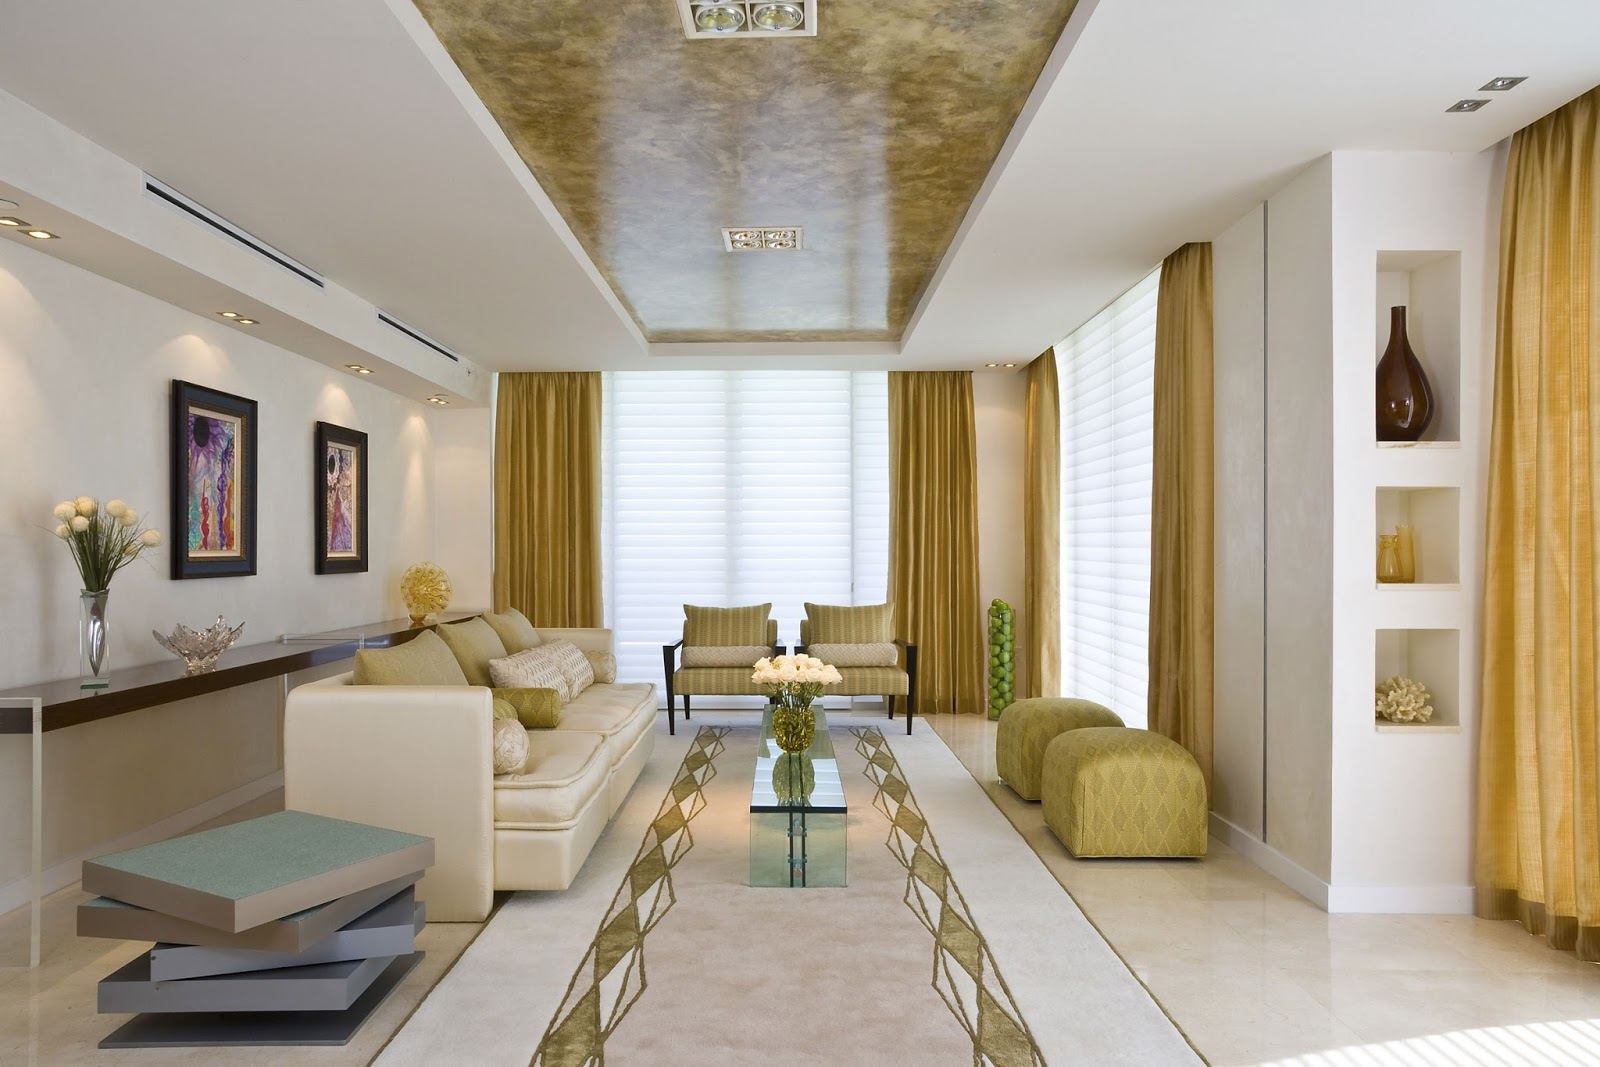 top 13 beautiful home interior designs mbgadget home interiors framed art